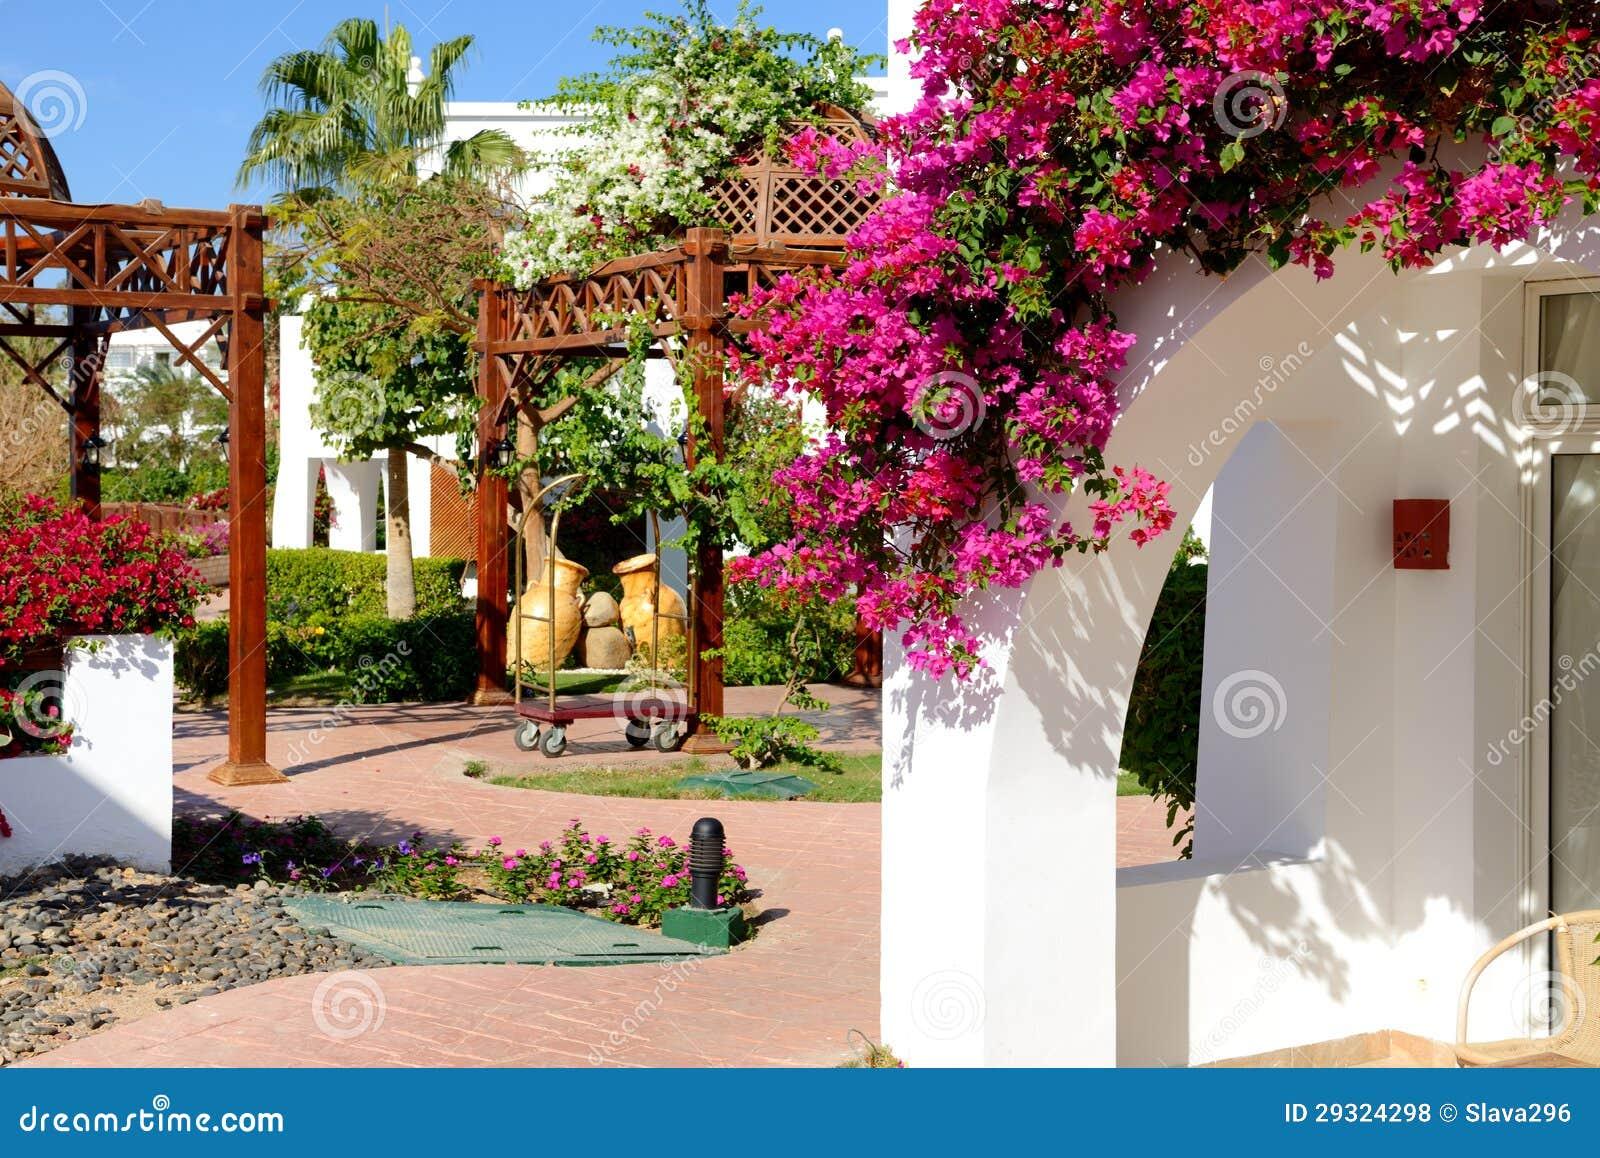 Villa decoration at the luxury hotel royalty free stock photos image 29324298 - Villa decoratie ...